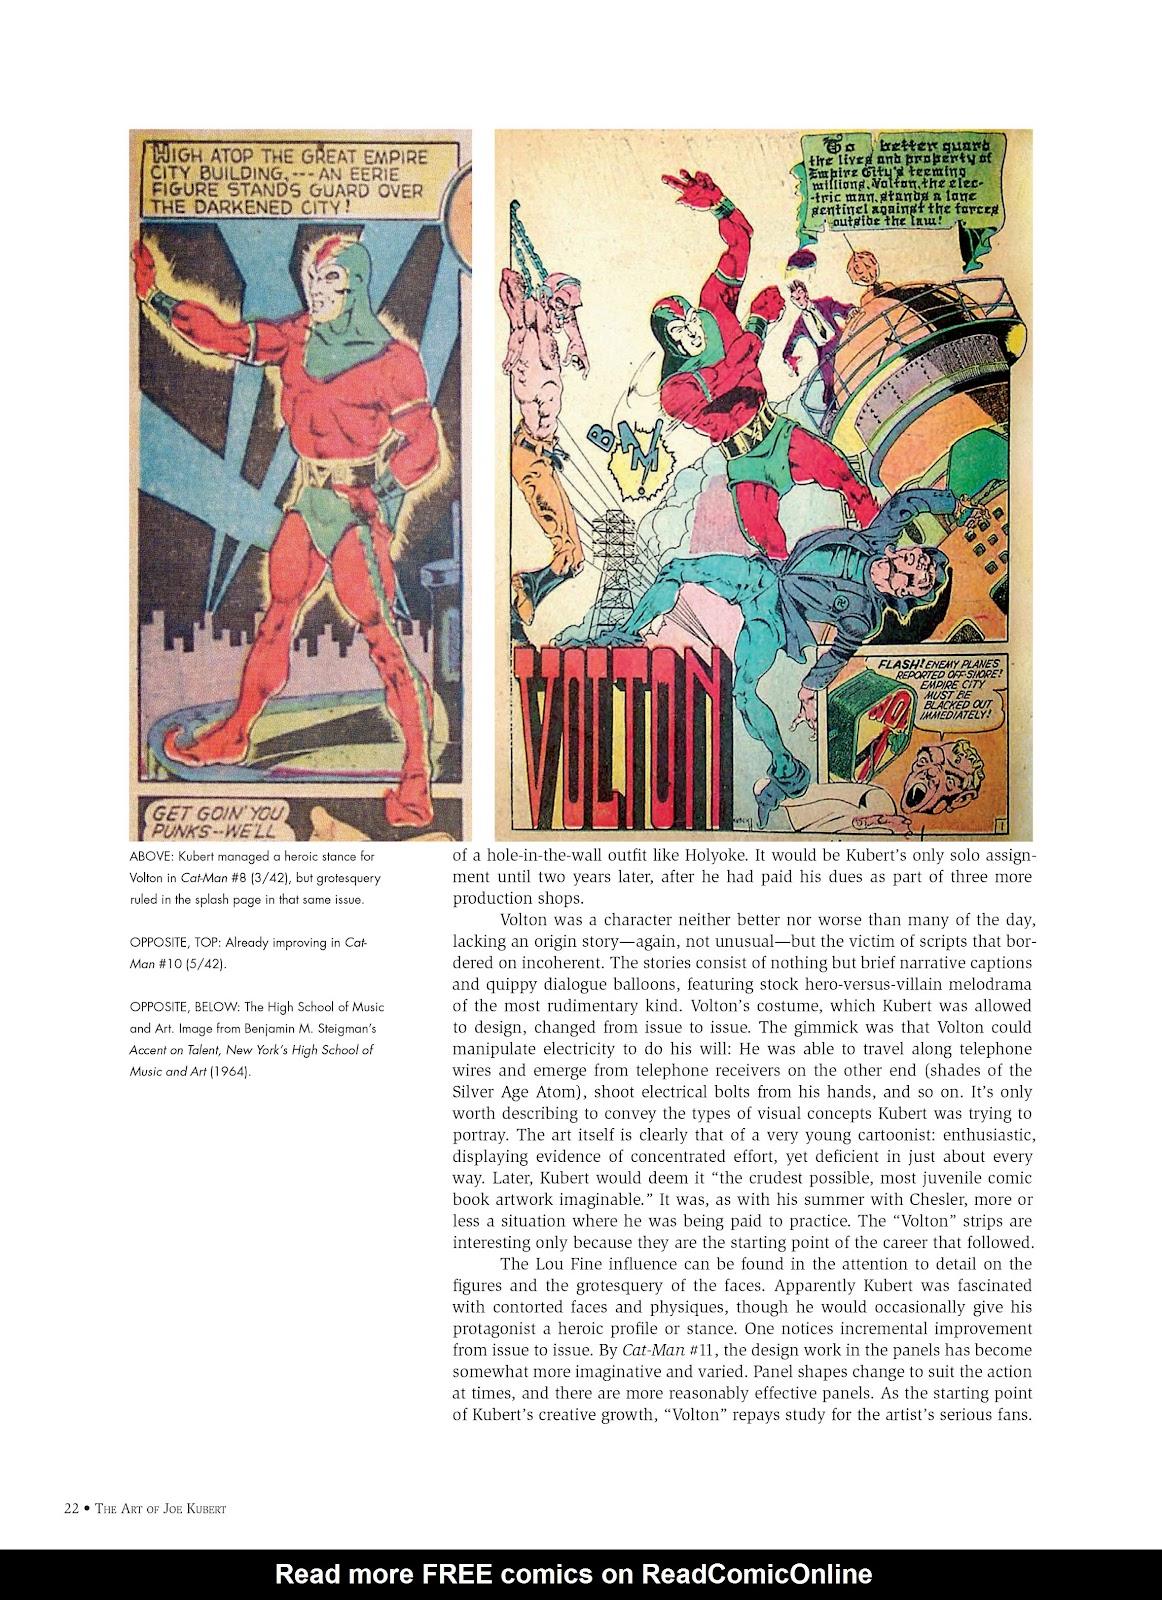 Read online The Art of Joe Kubert comic -  Issue # TPB (Part 1) - 21